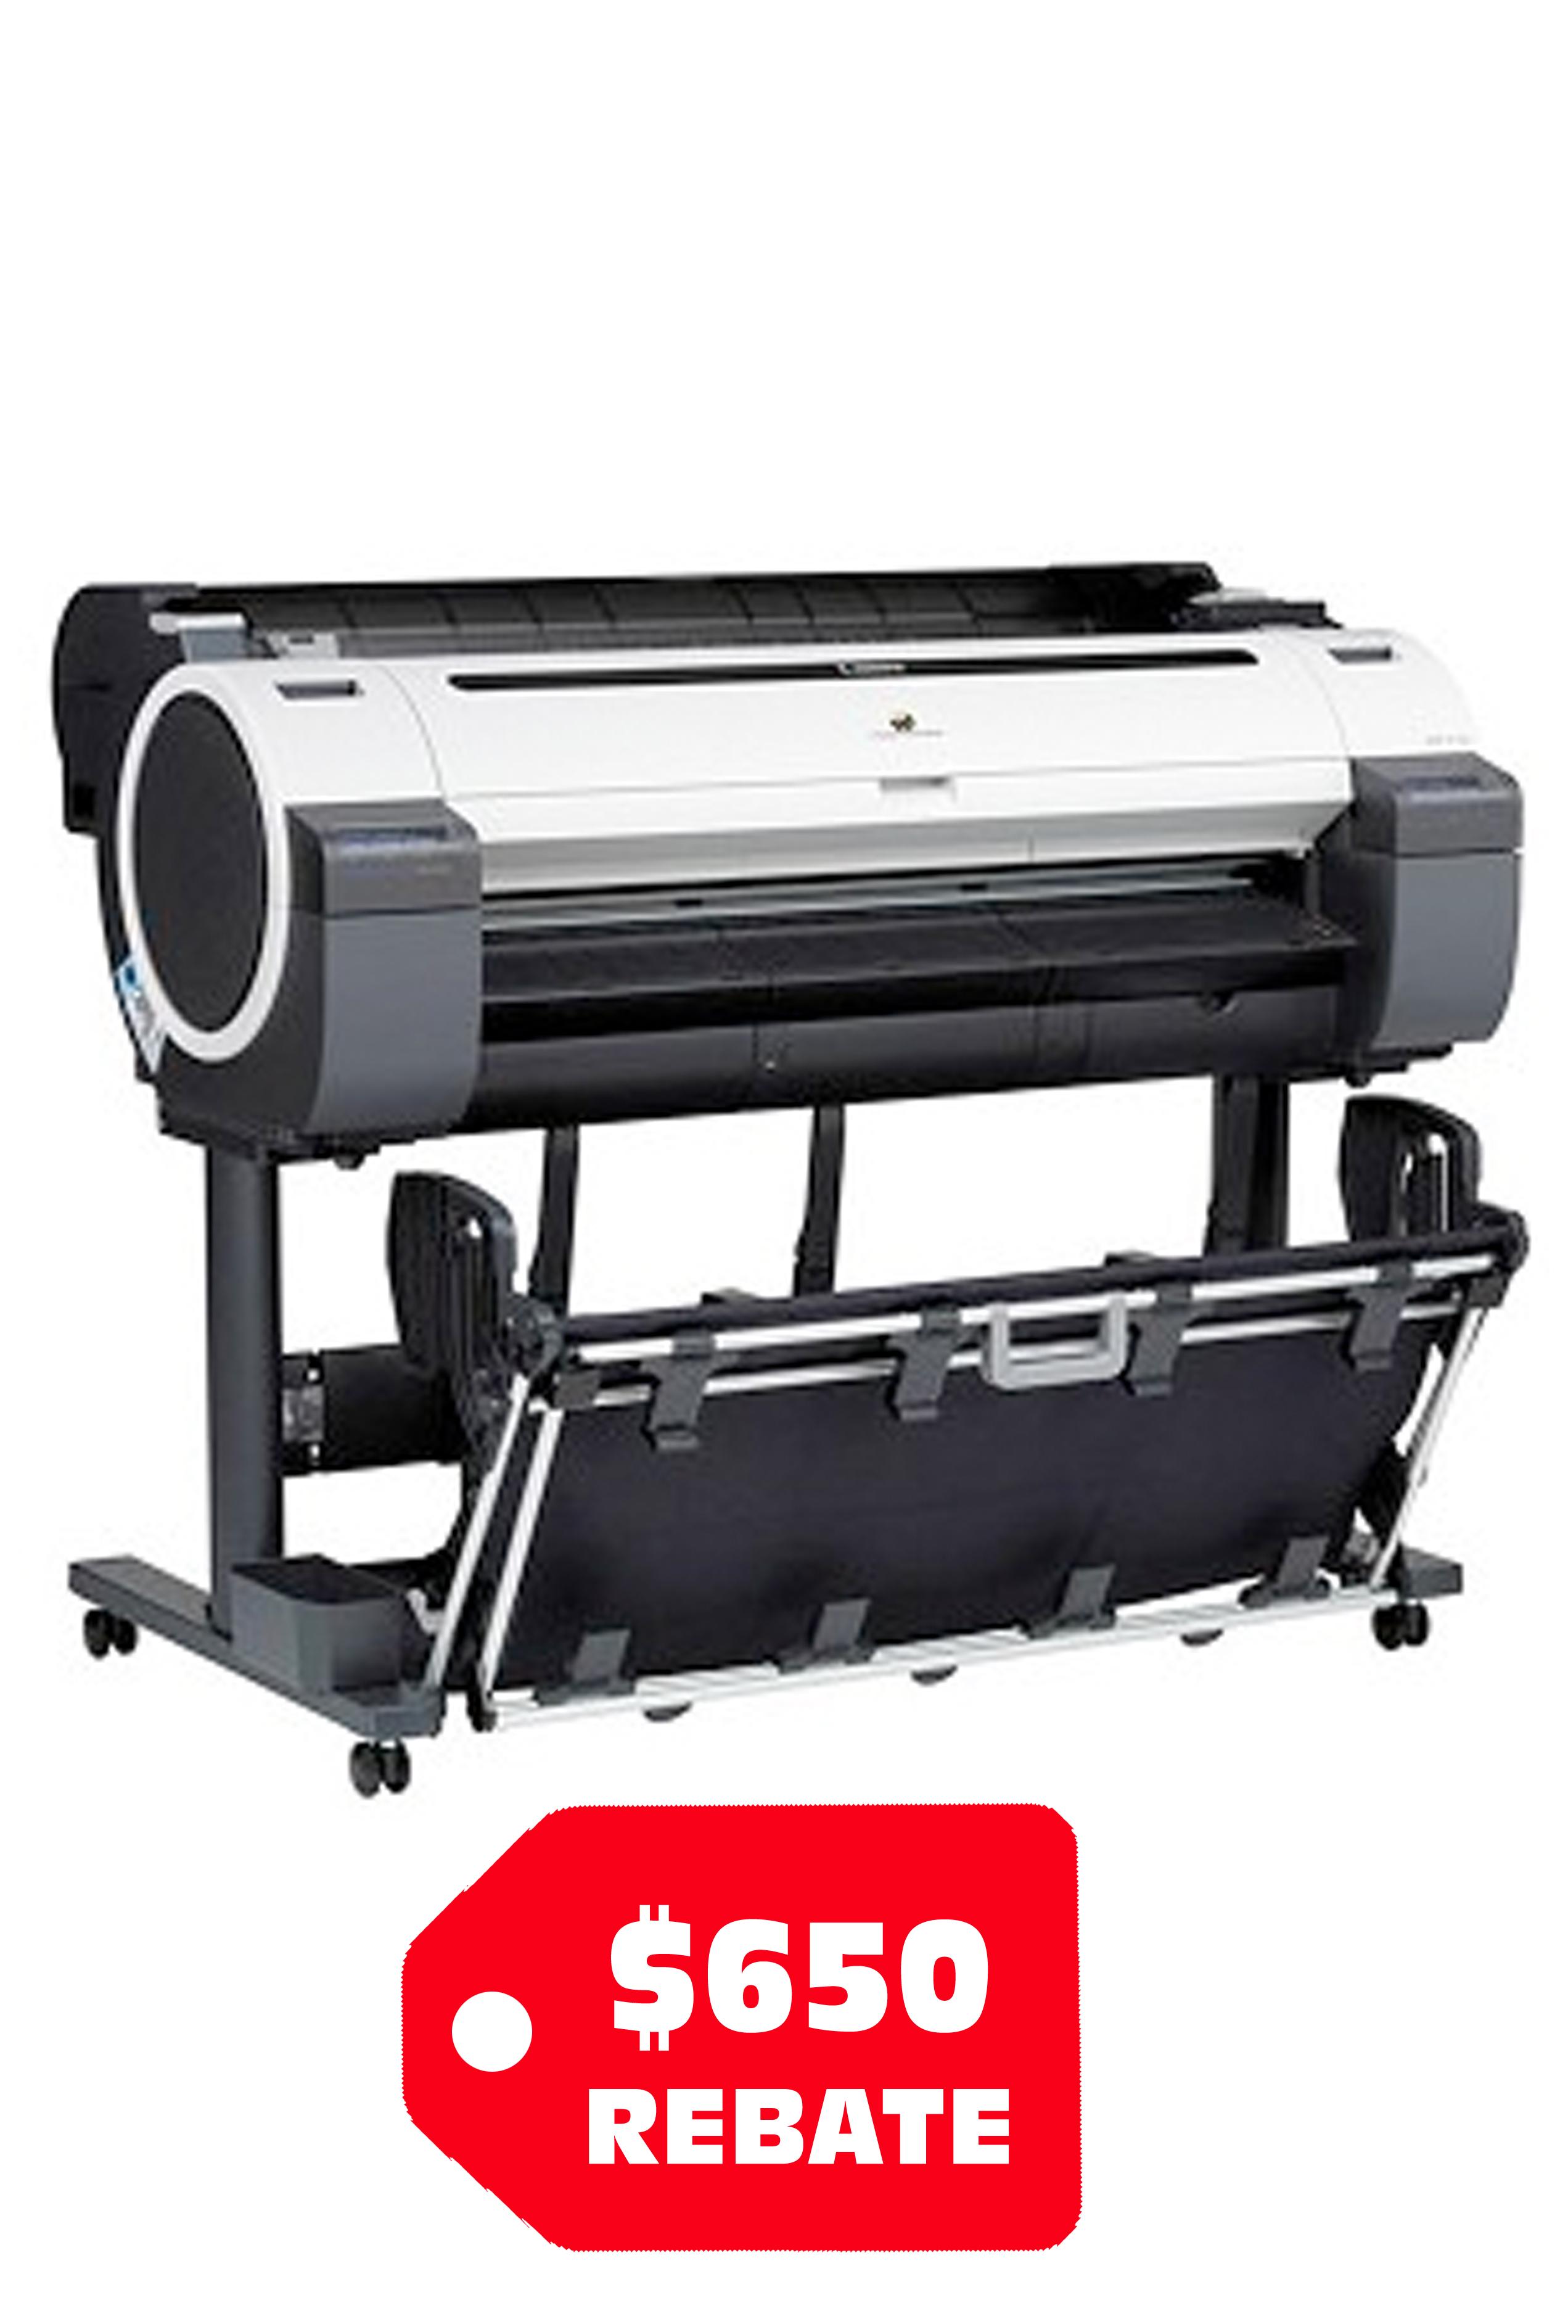 Canon imagePROGRAF iPF770 MFP M40